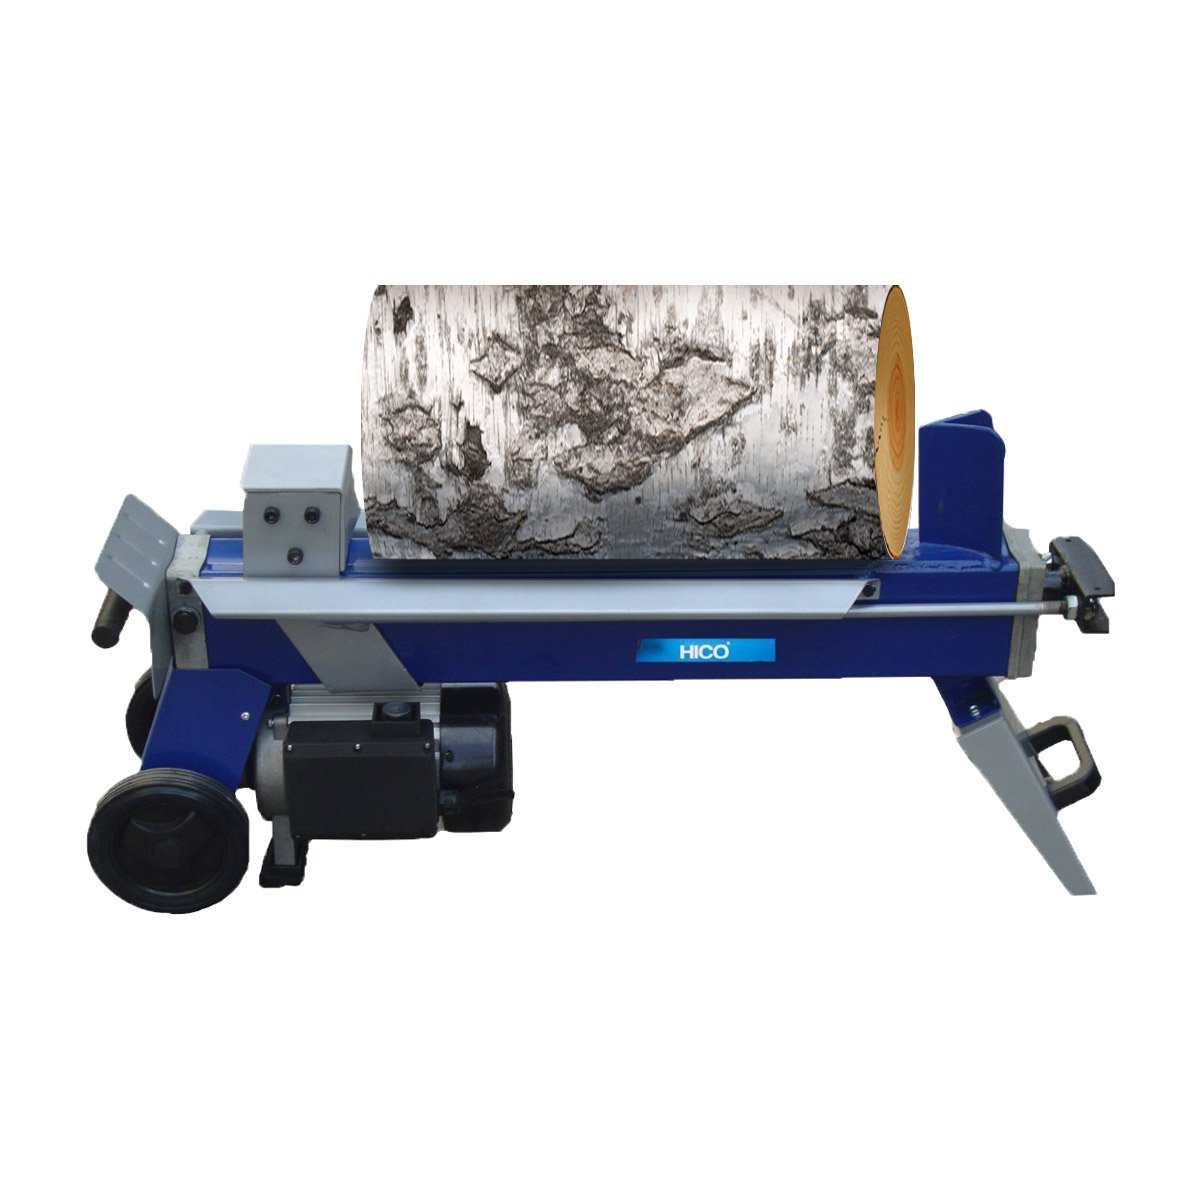 HICO-LSP0552 5 Ton Electric Log Splitter firewood splitter 2 HP 1500W